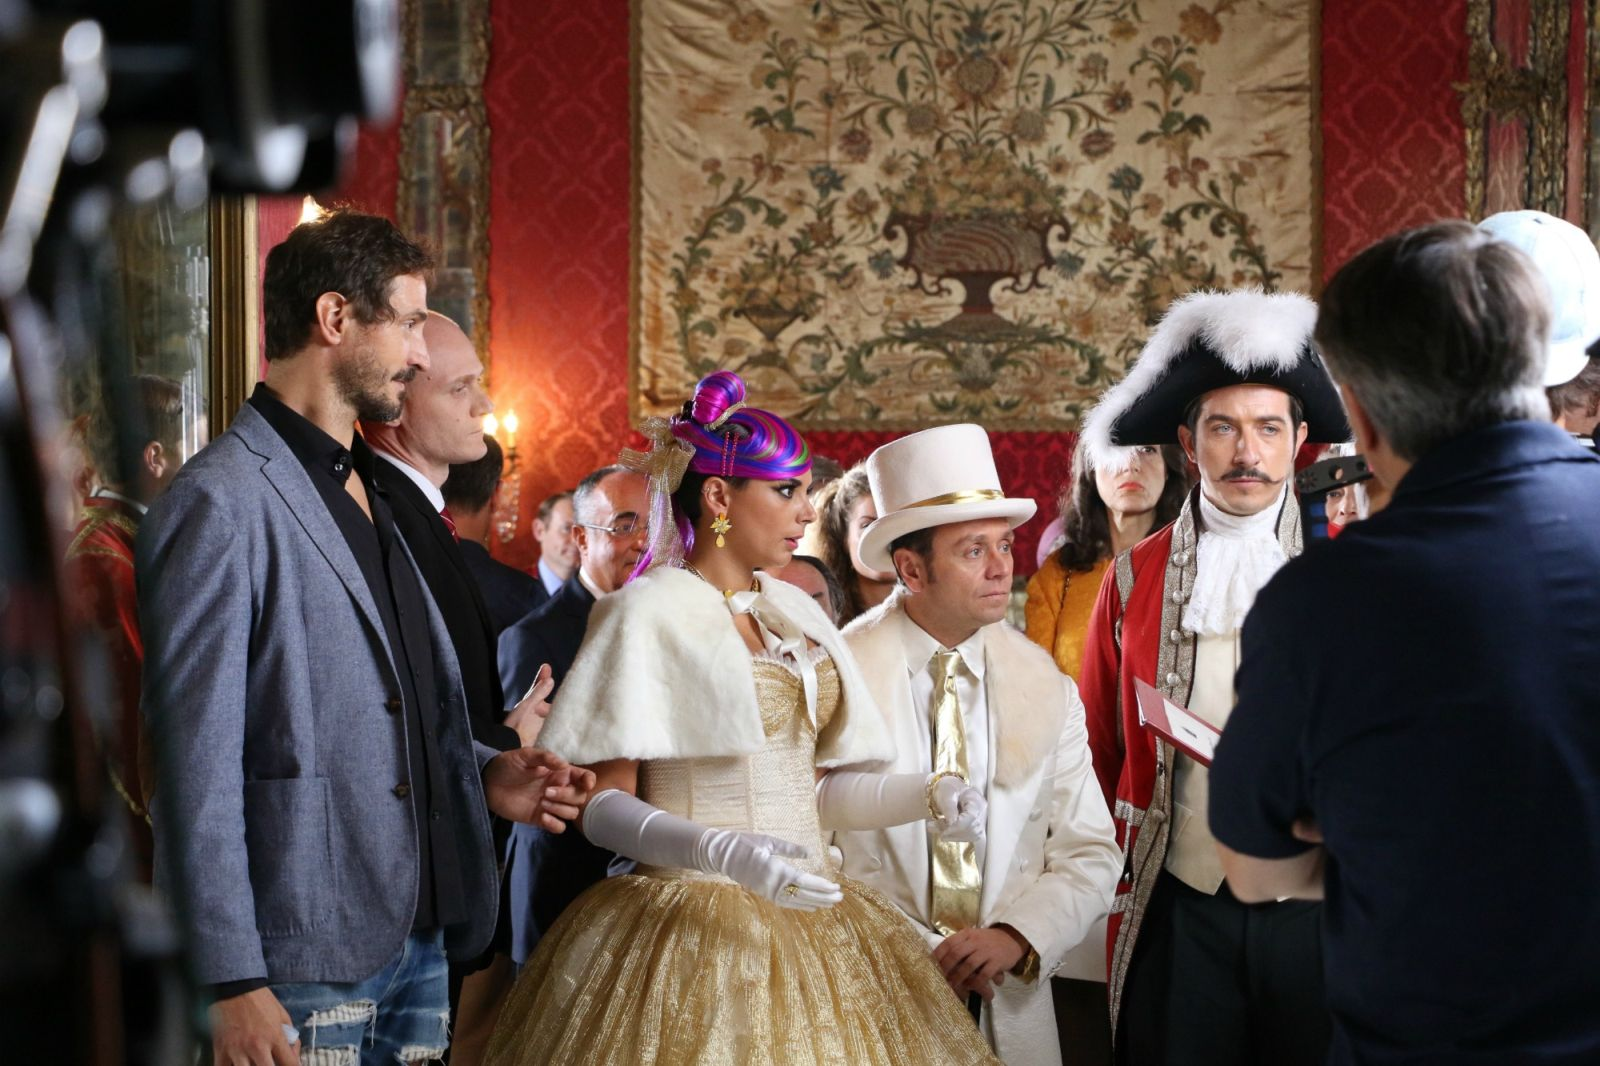 Natale a Londra - Dio salvi la Regina: un'immagine di gruppo dal set